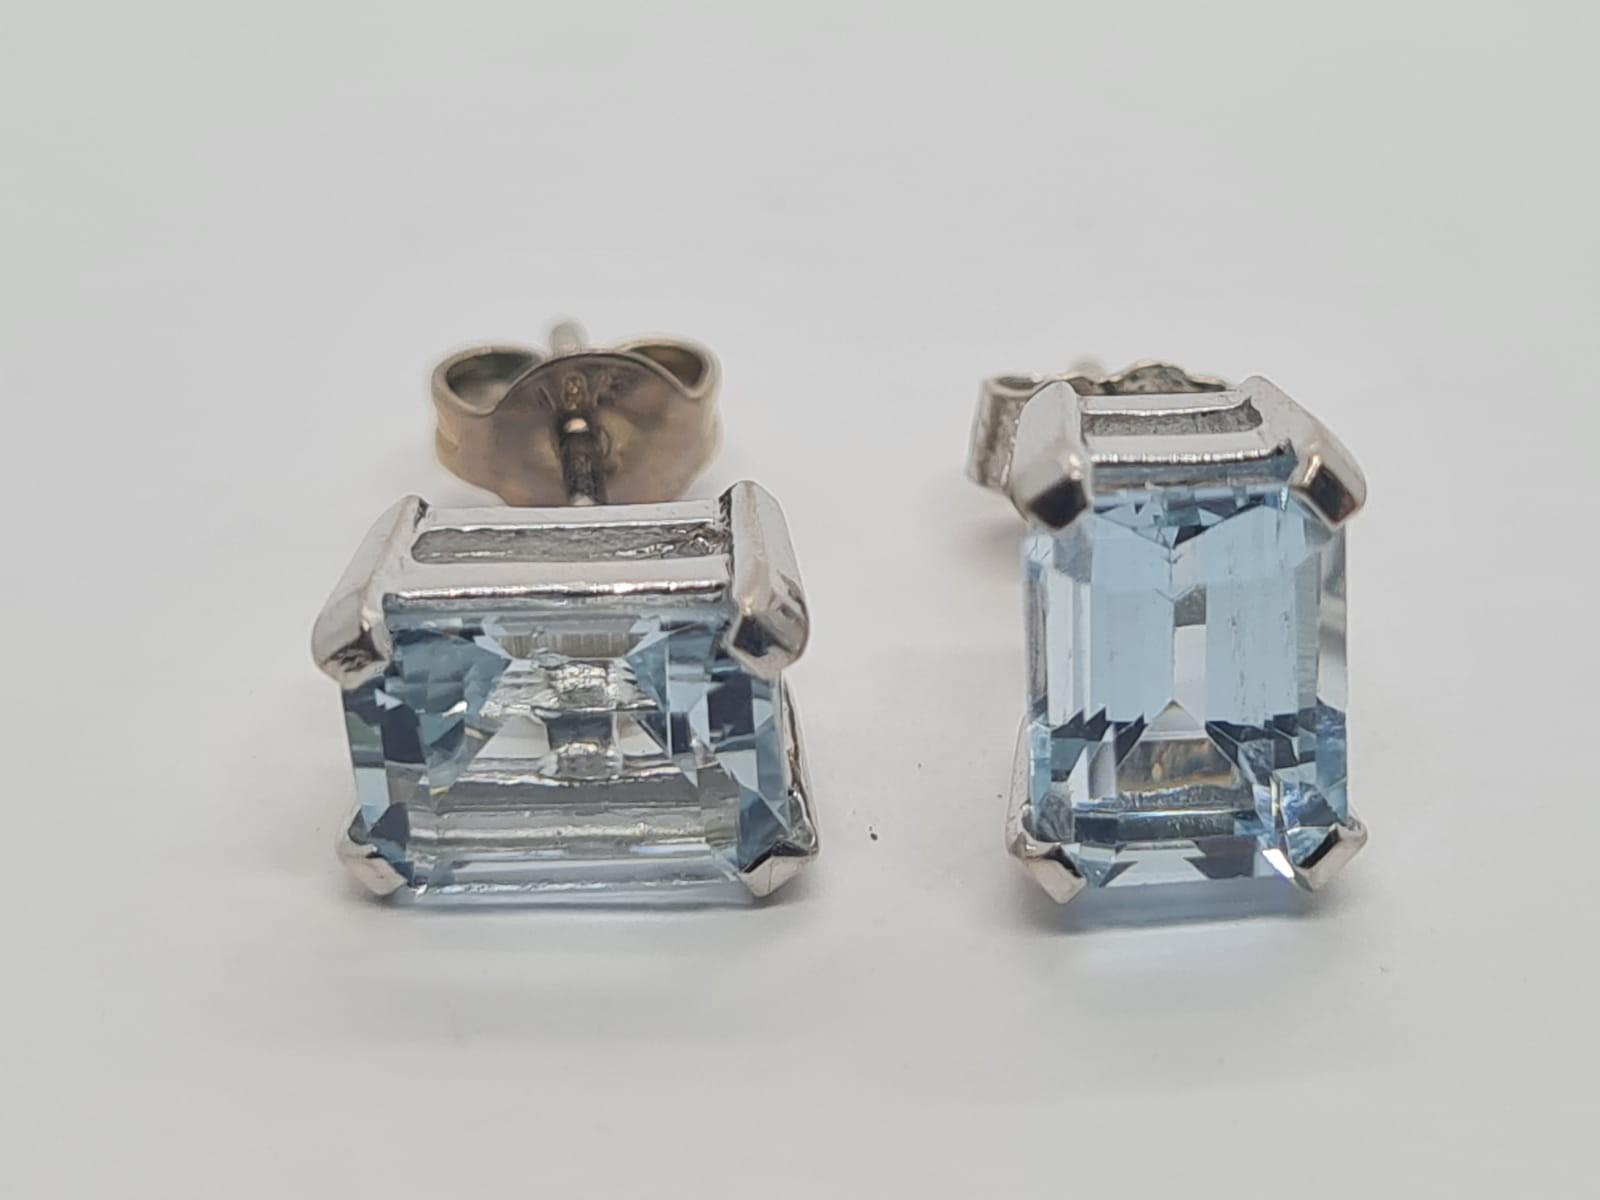 Pair of aquamarine stud earrings set in 18k white gold, weight 3.3g